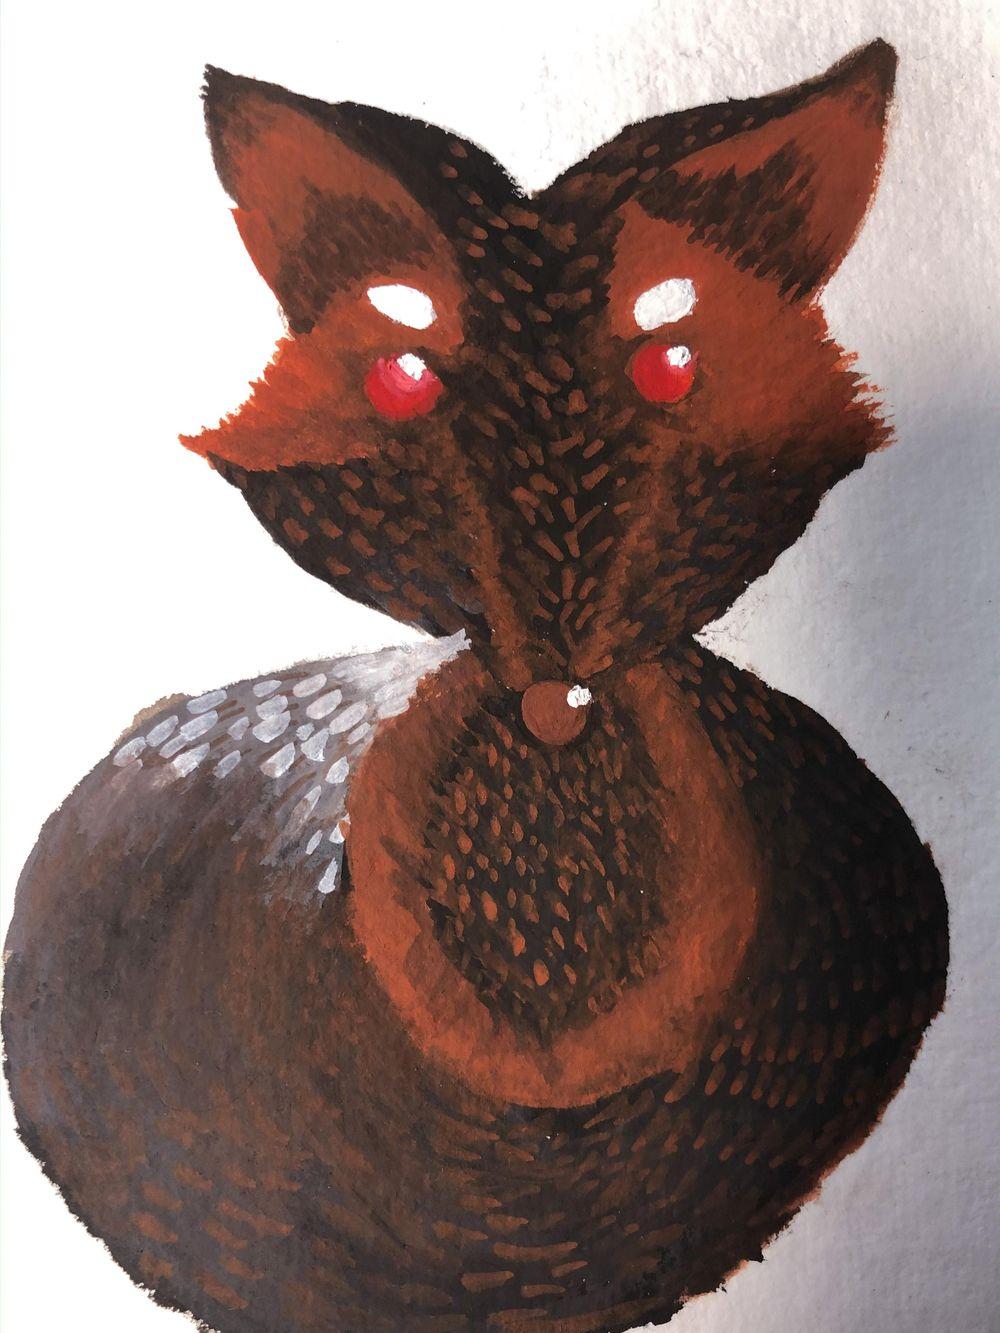 Melanistic Fox Ilustration - image 1 - student project